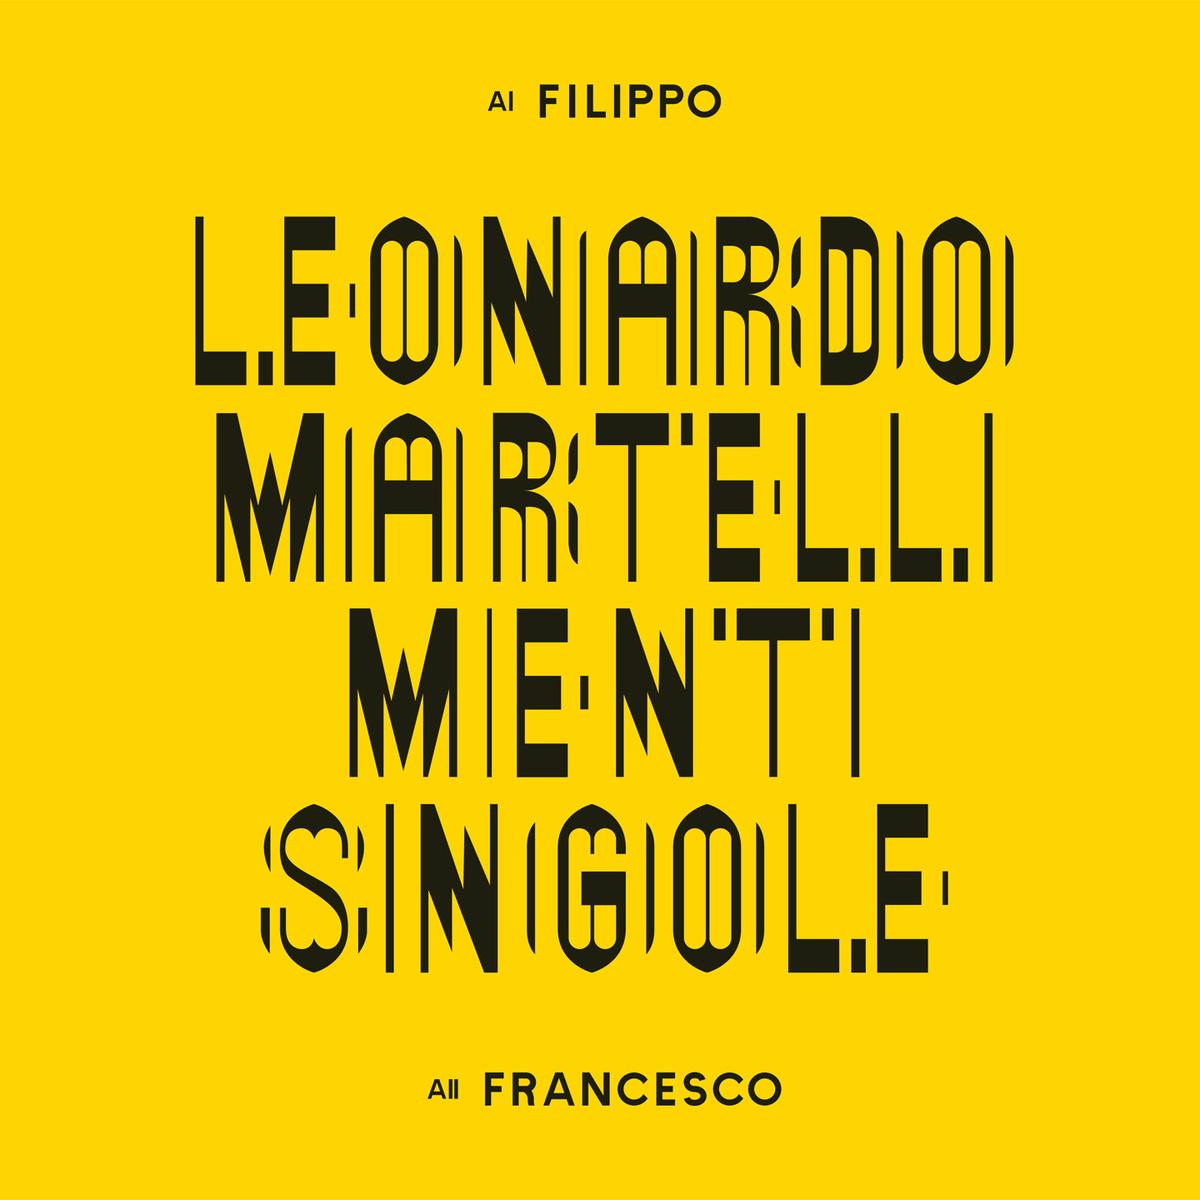 LEONARDO MARTELLI - MENTI SINGOLE